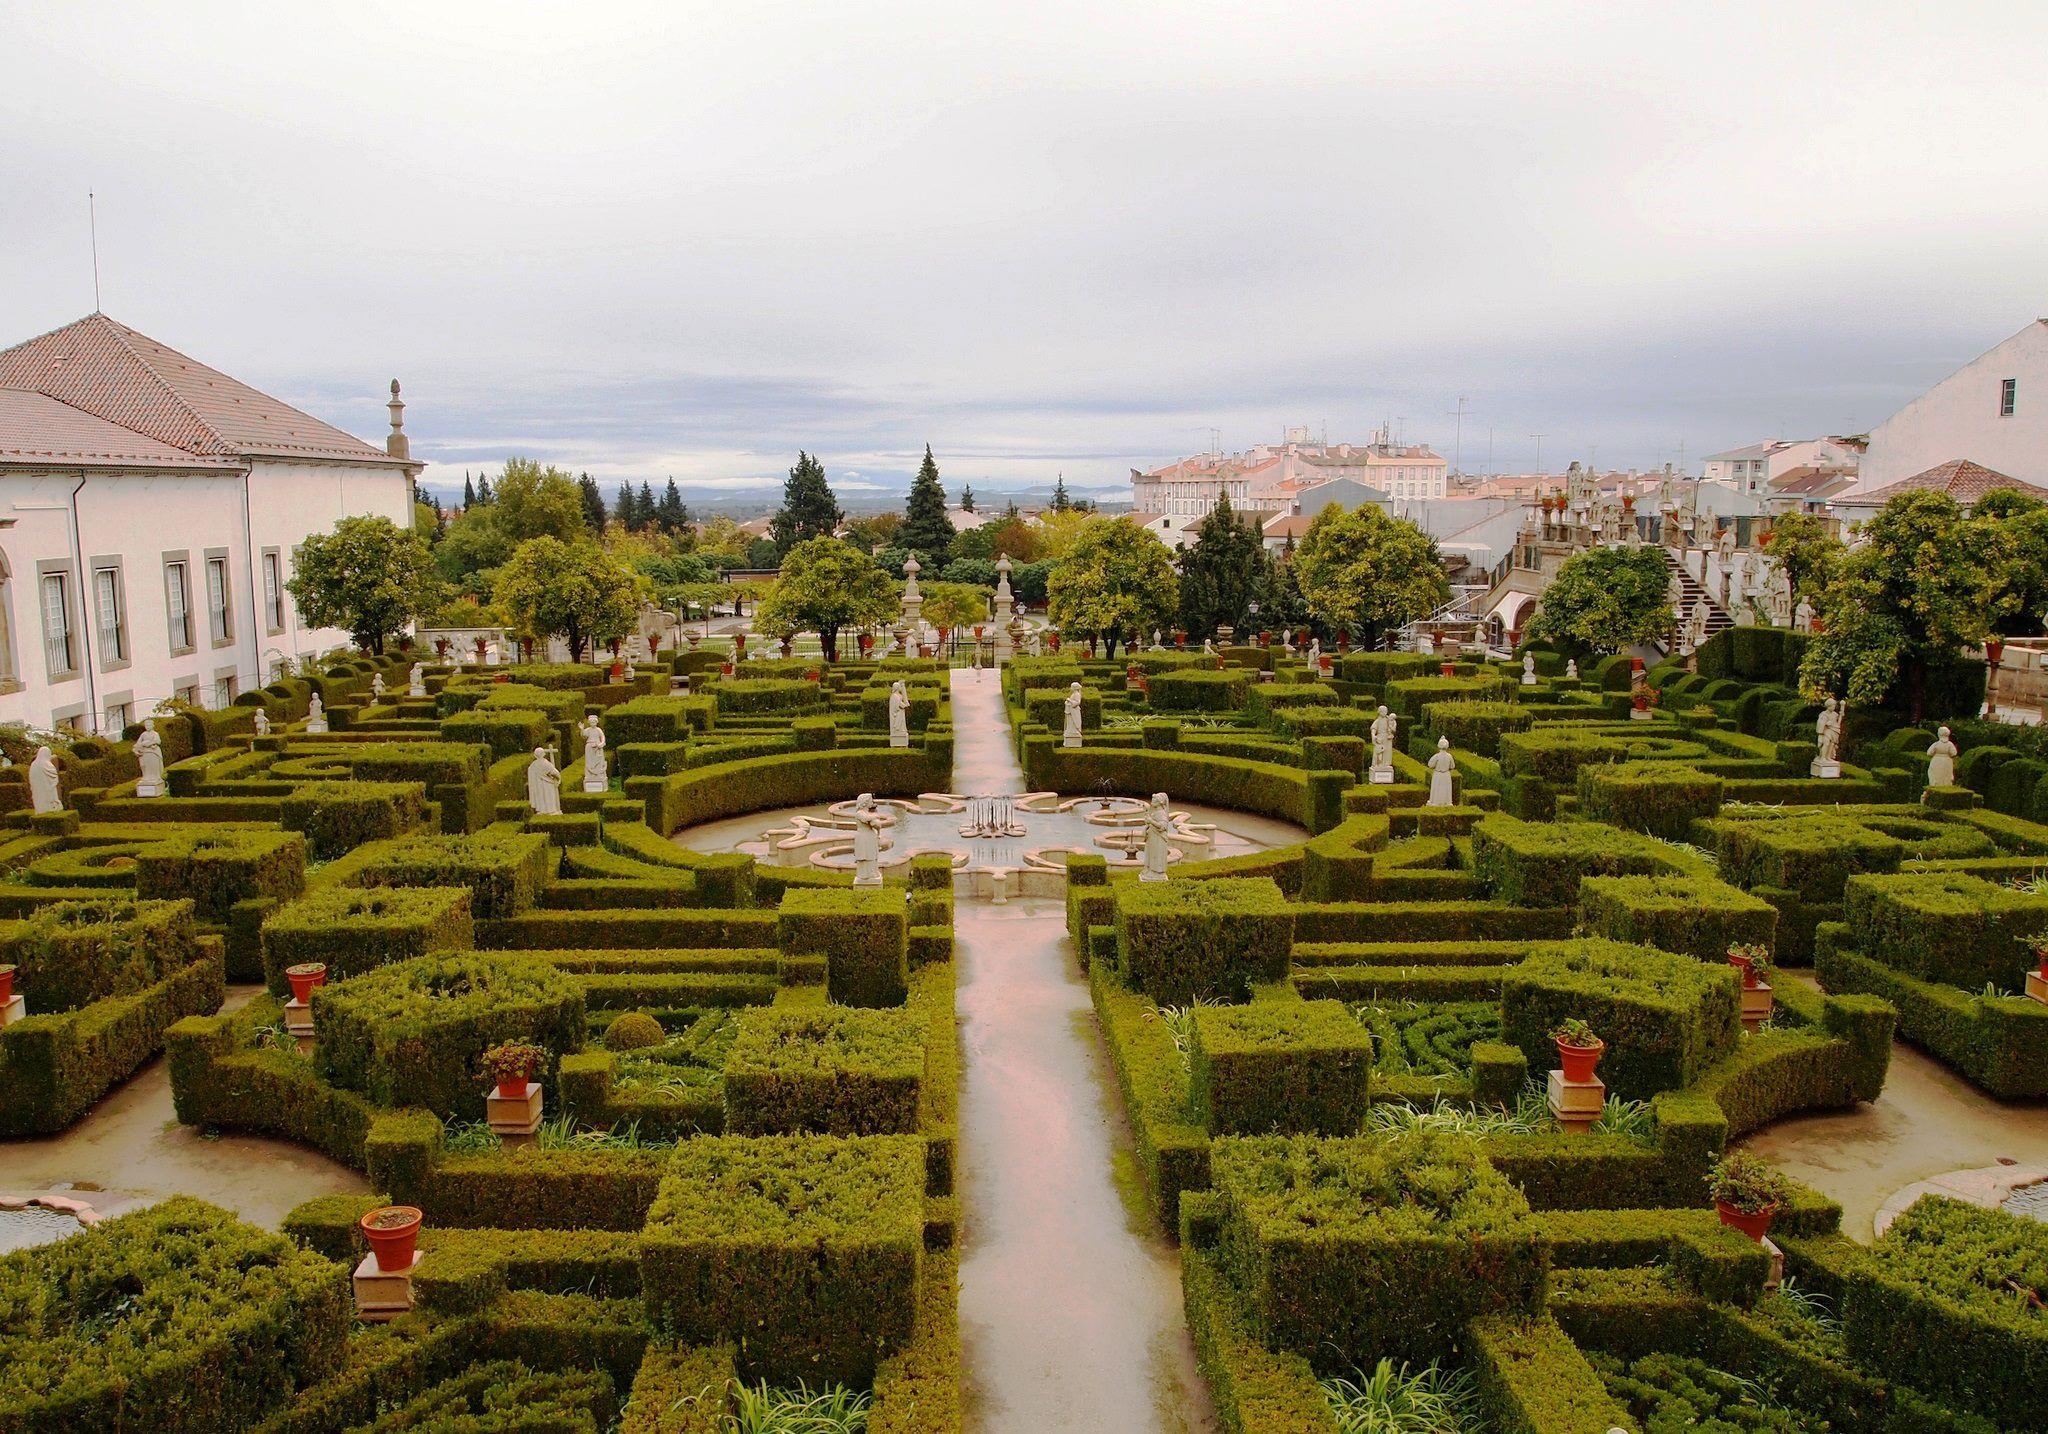 Jardim das Estátuas, Castelo Branco